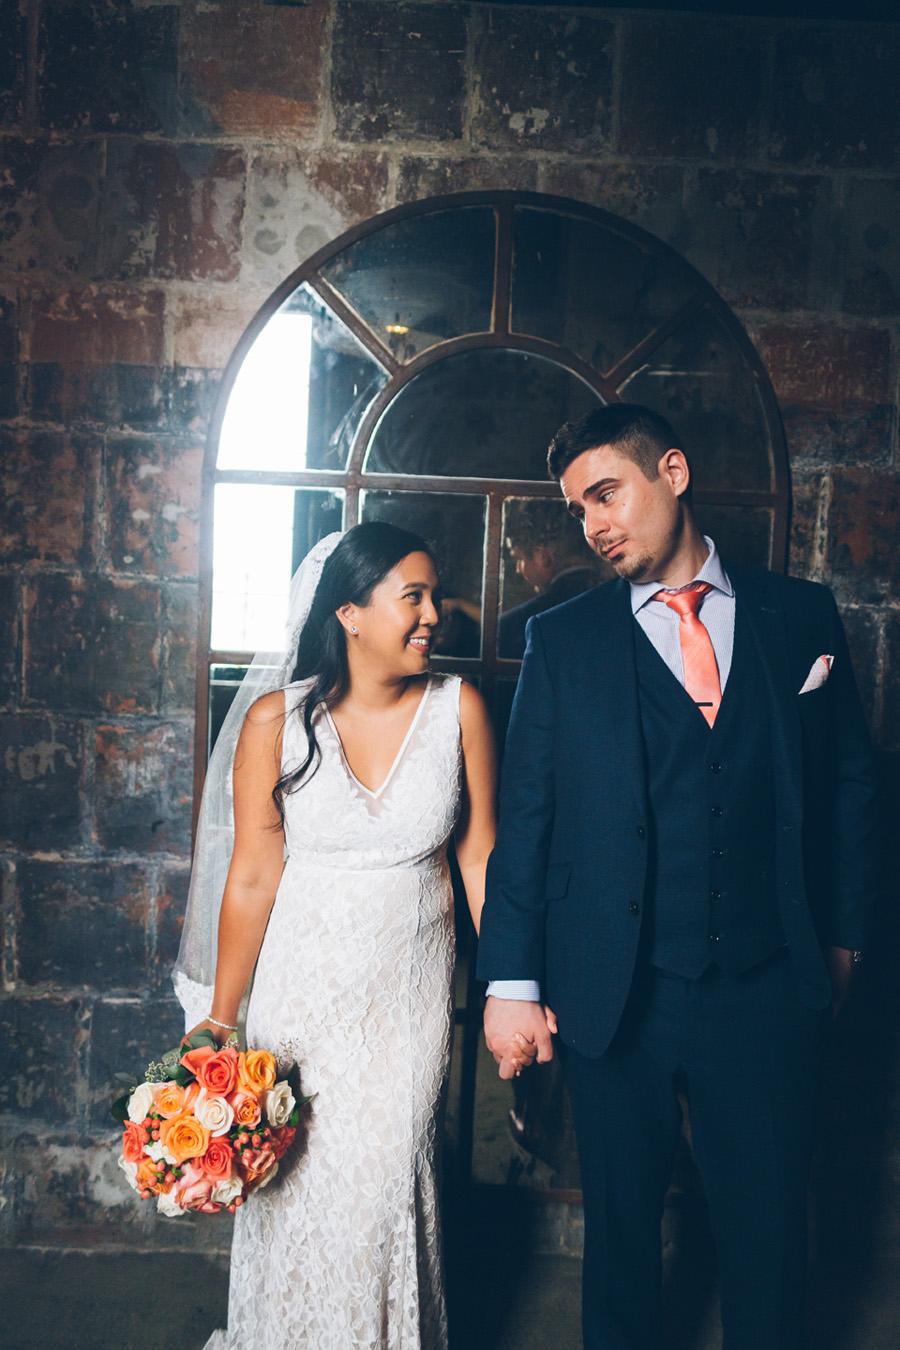 POOH-PETER-NYC-WEDDING-BRIDEGROOM-CYNTHIACHUNG-0241.jpg